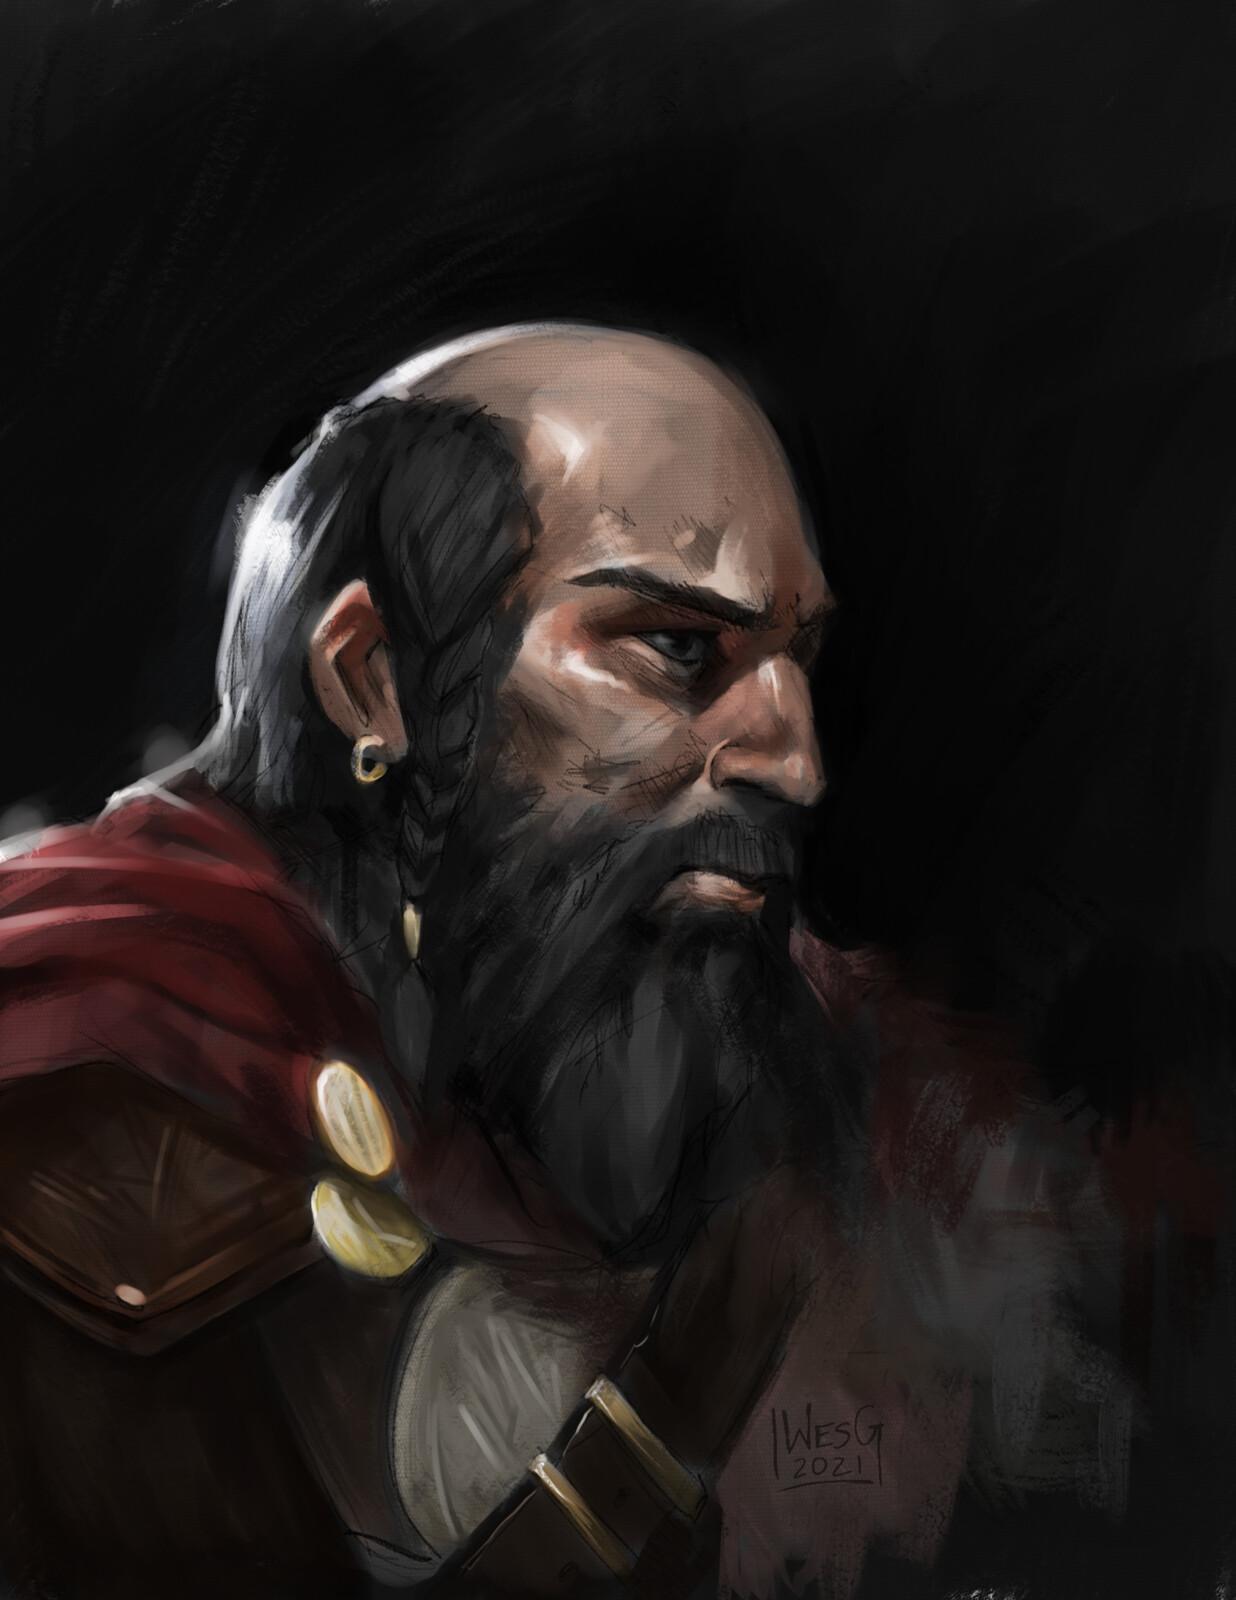 An Old Warrior